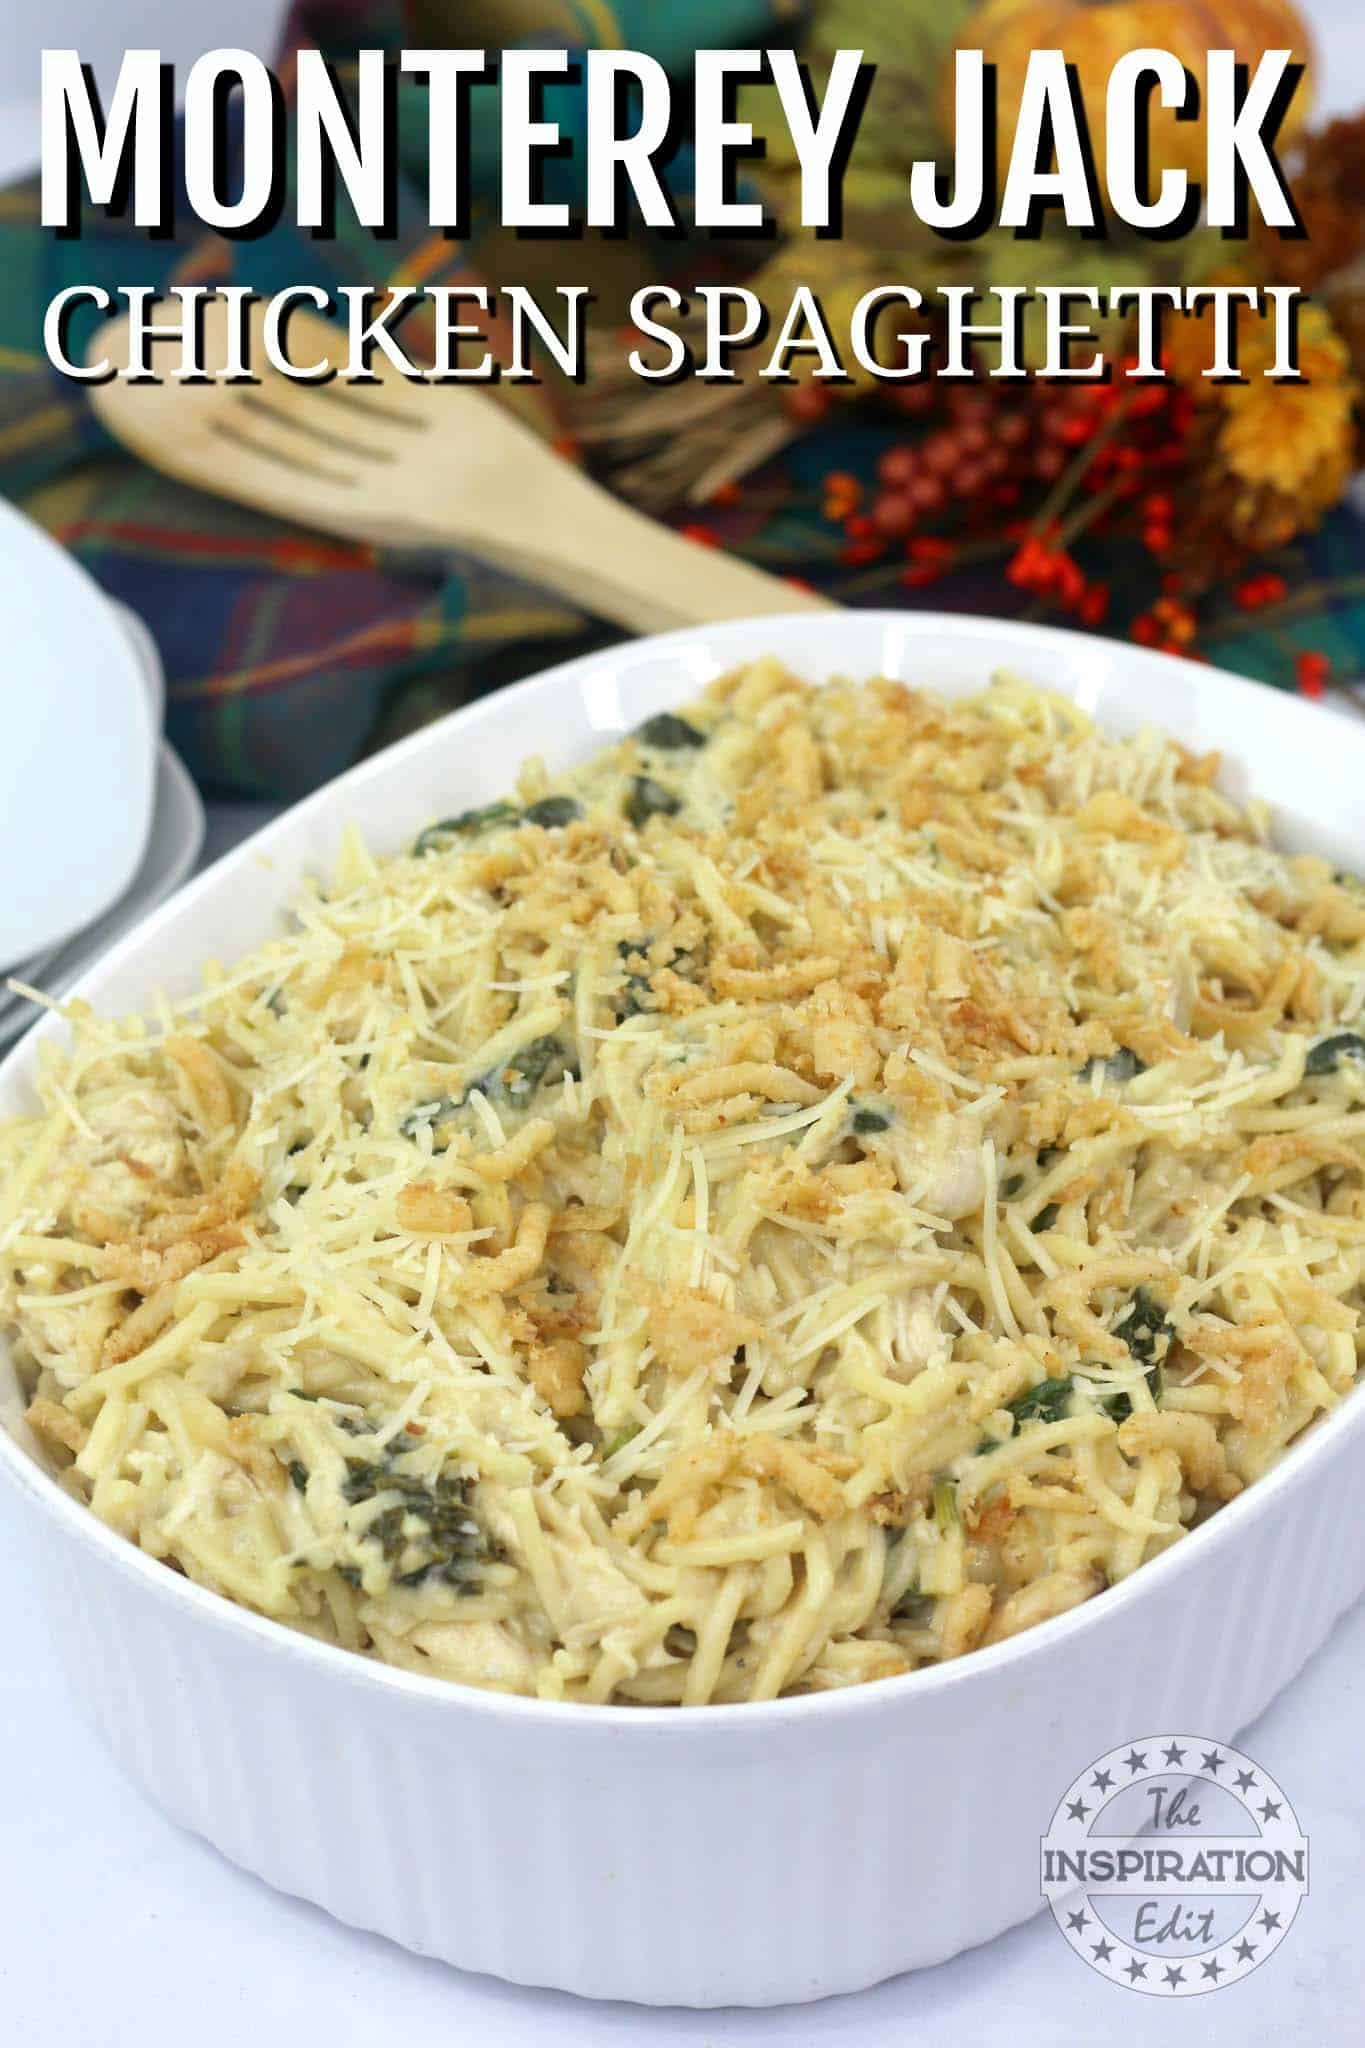 Monterey jack chicken spaghetti recipe